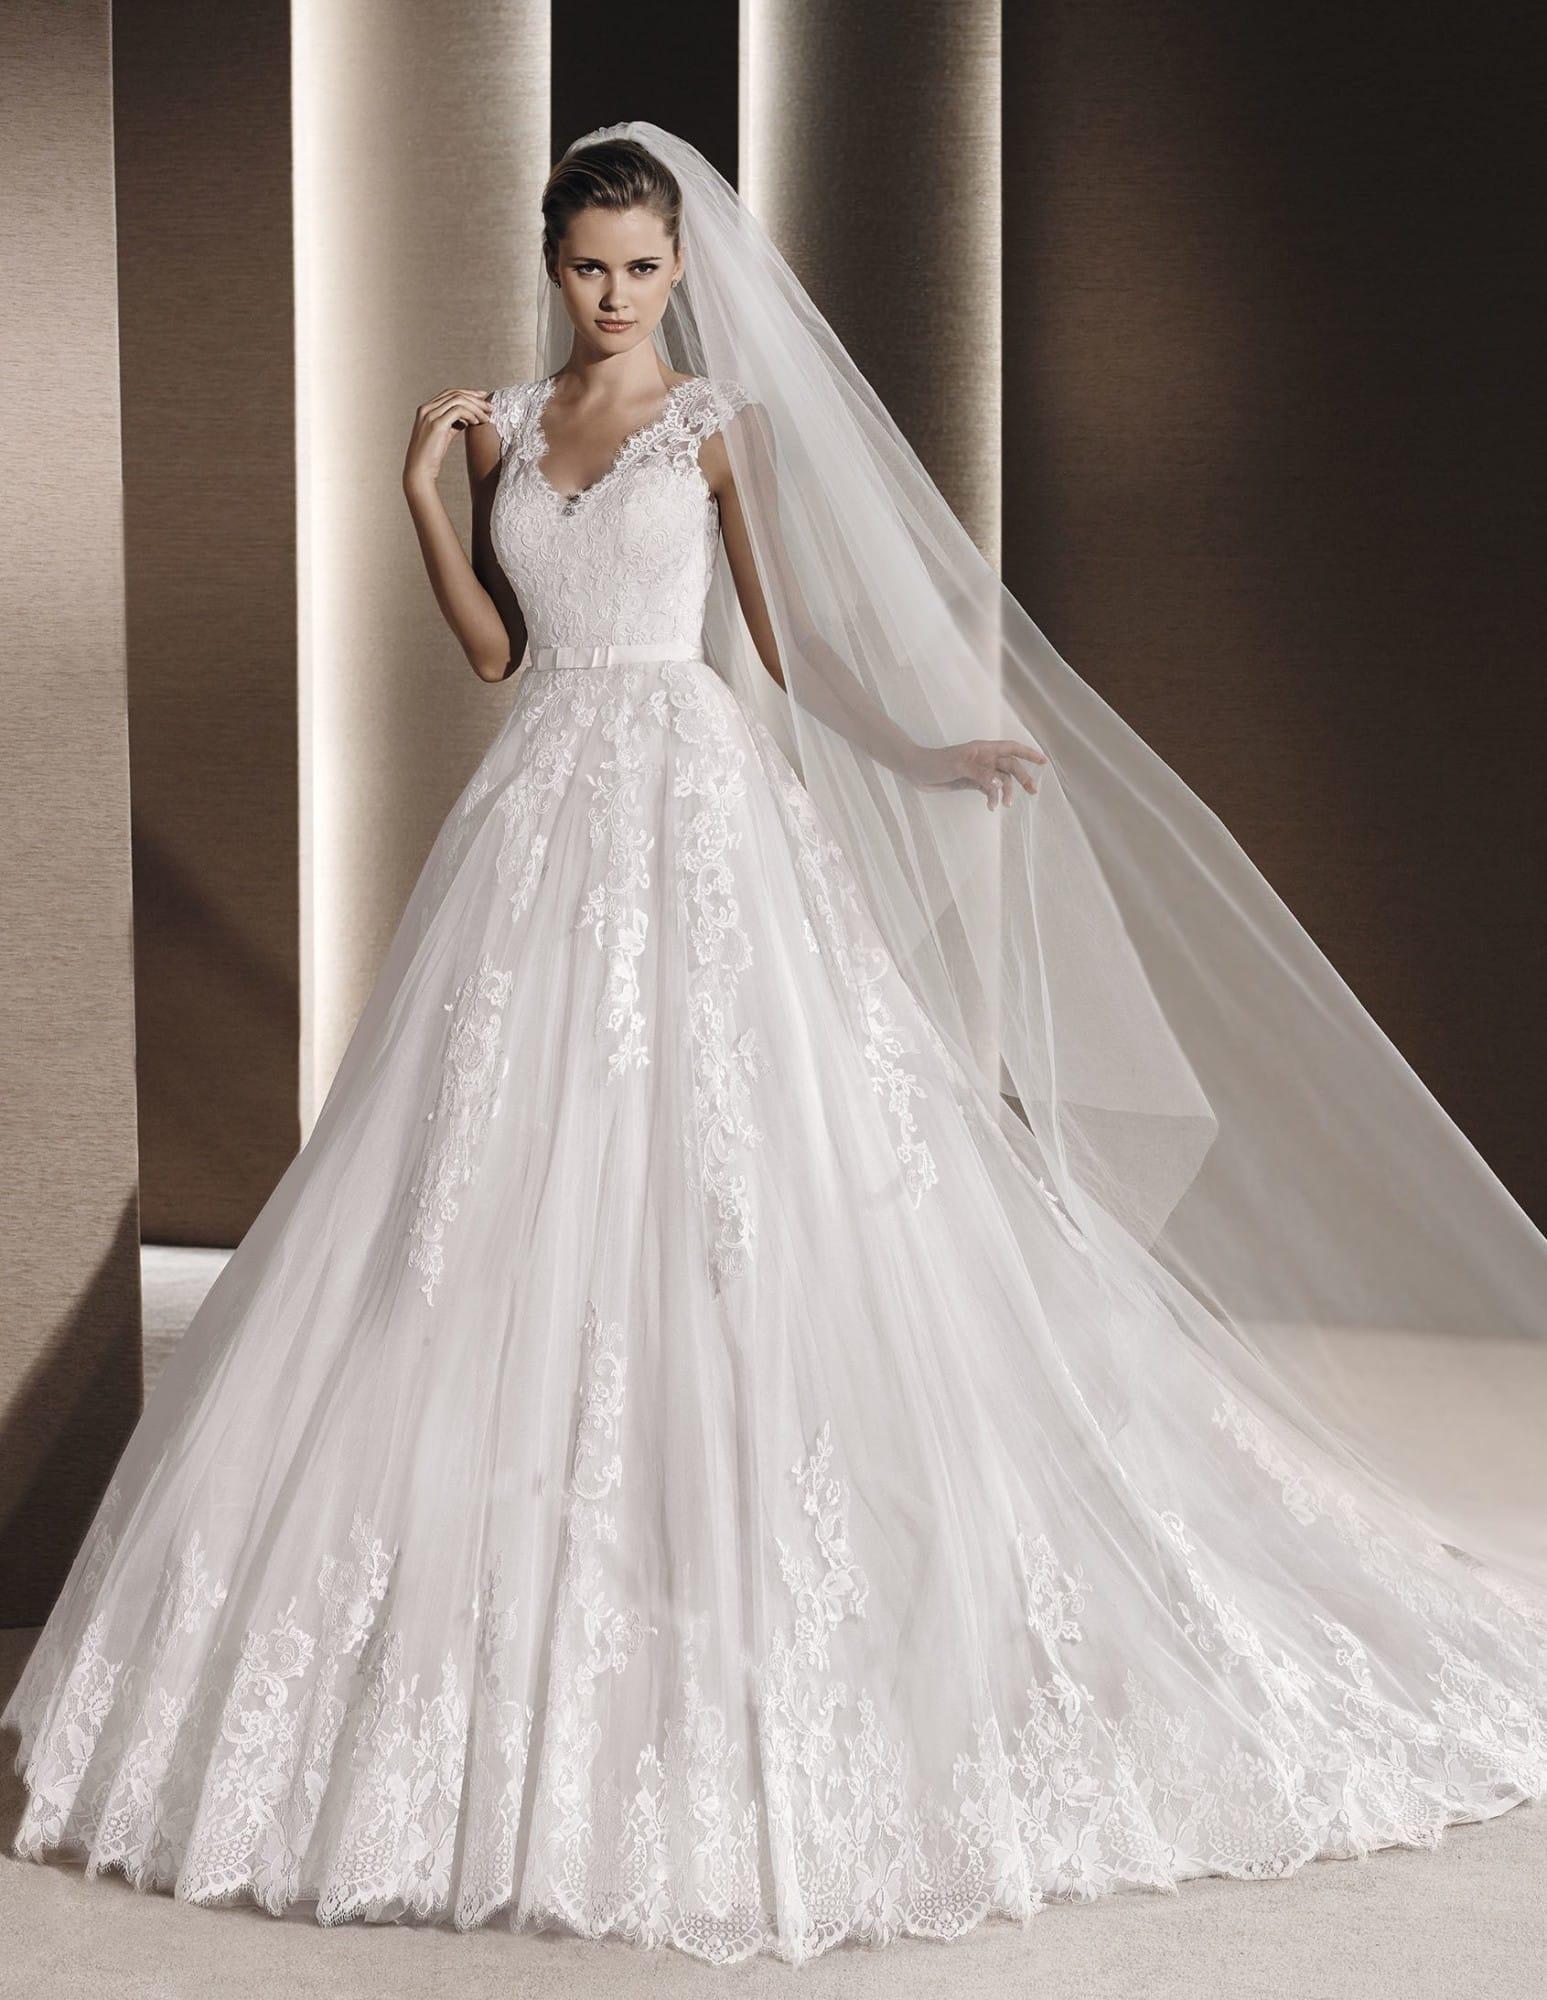 La Sposa Raven Gown